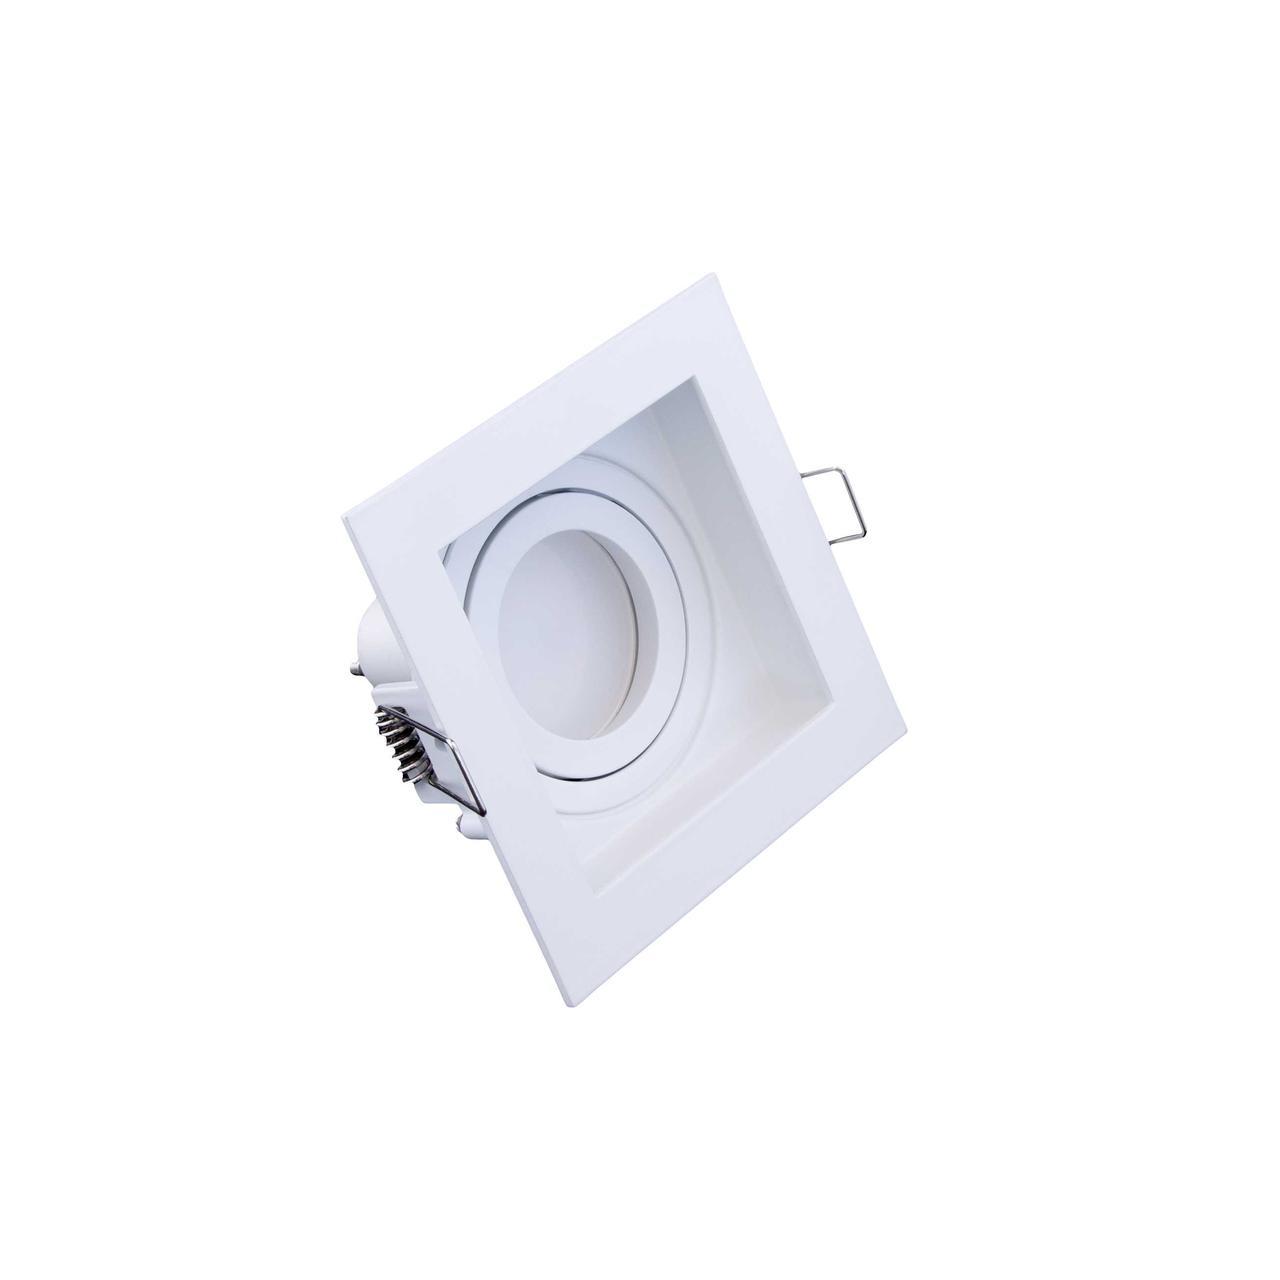 Led спот врезной квадрат белыйTH3530 WH